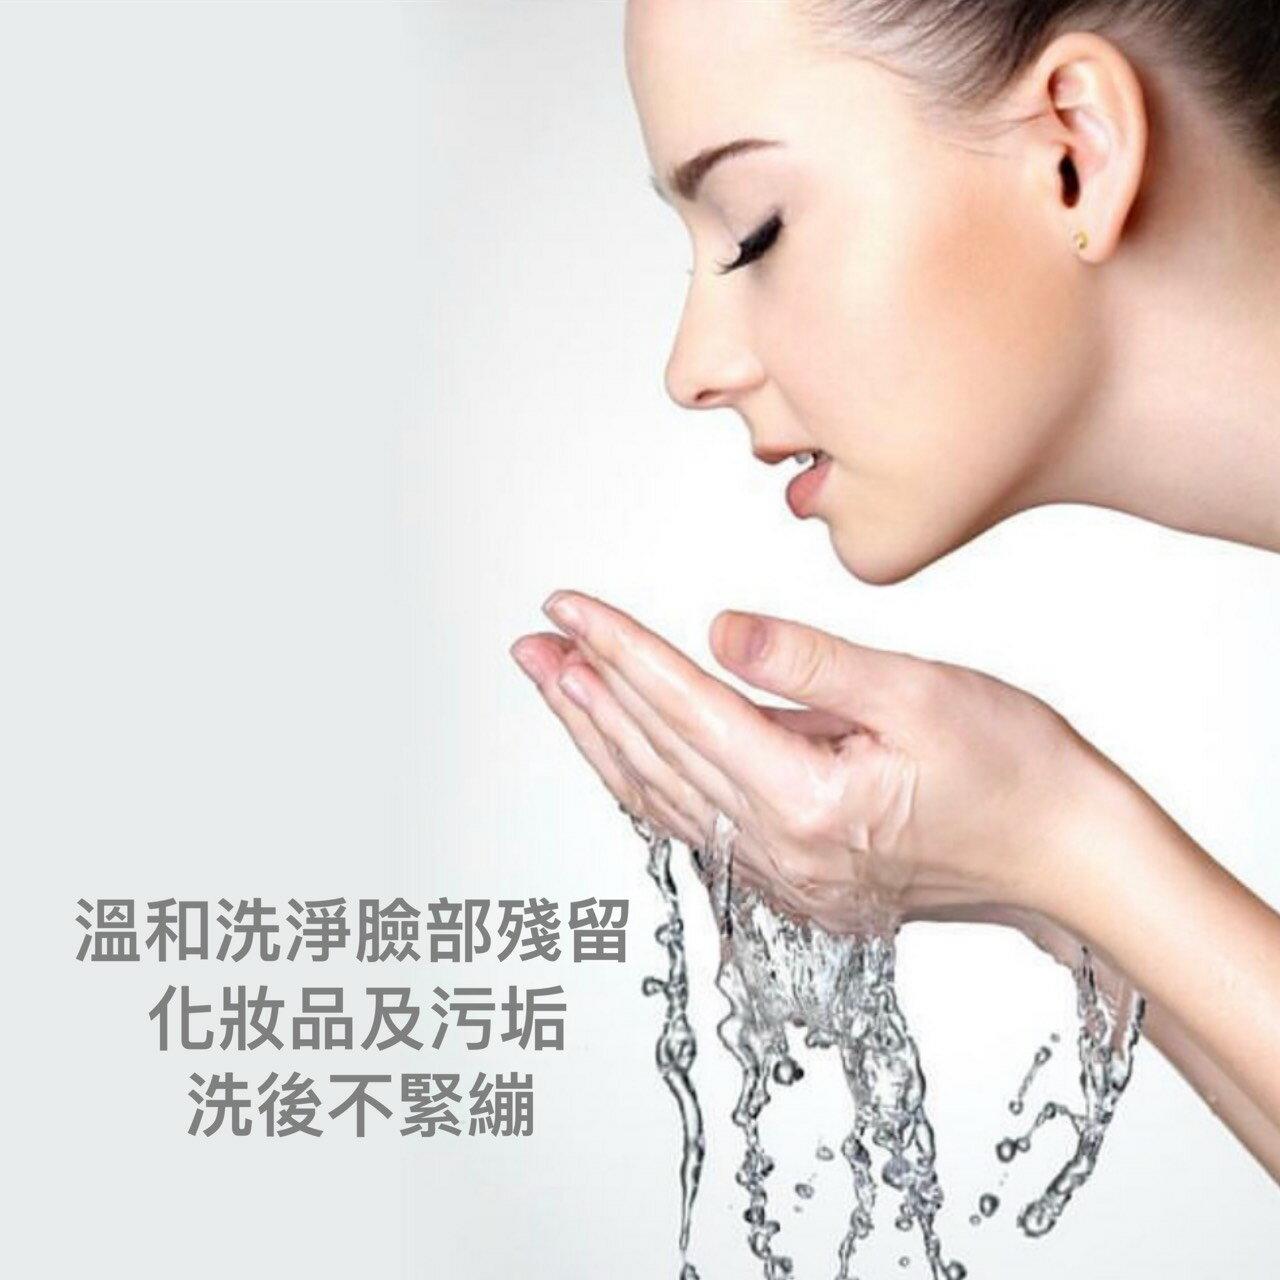 gla skincare 中乾性溫和洗面露 150ml 〔渼妍國際〕